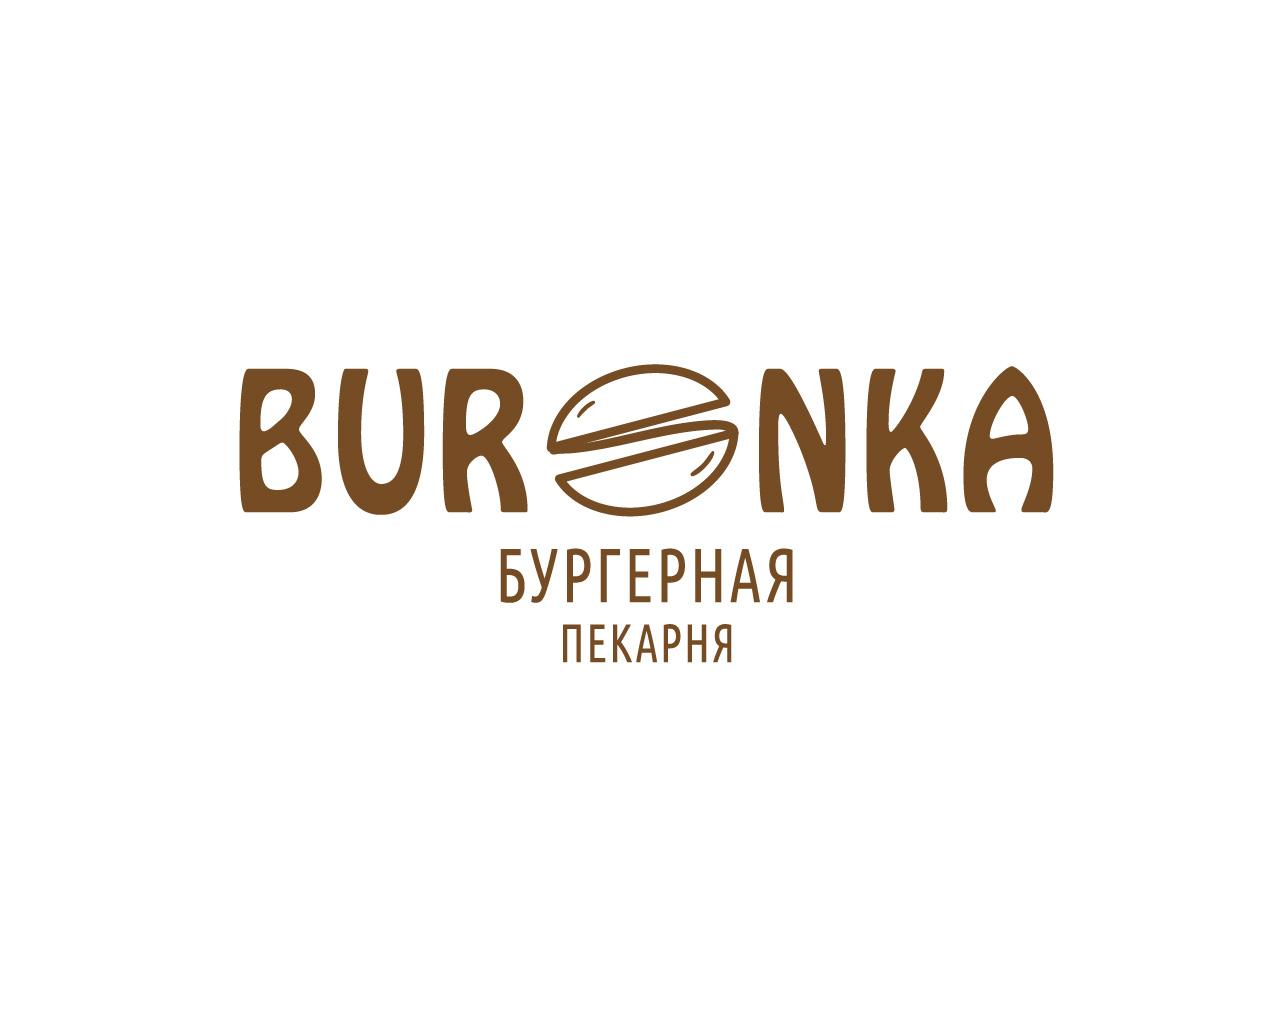 Логотип для Бургерной с Пекарней фото f_9795e16fc562a124.jpg